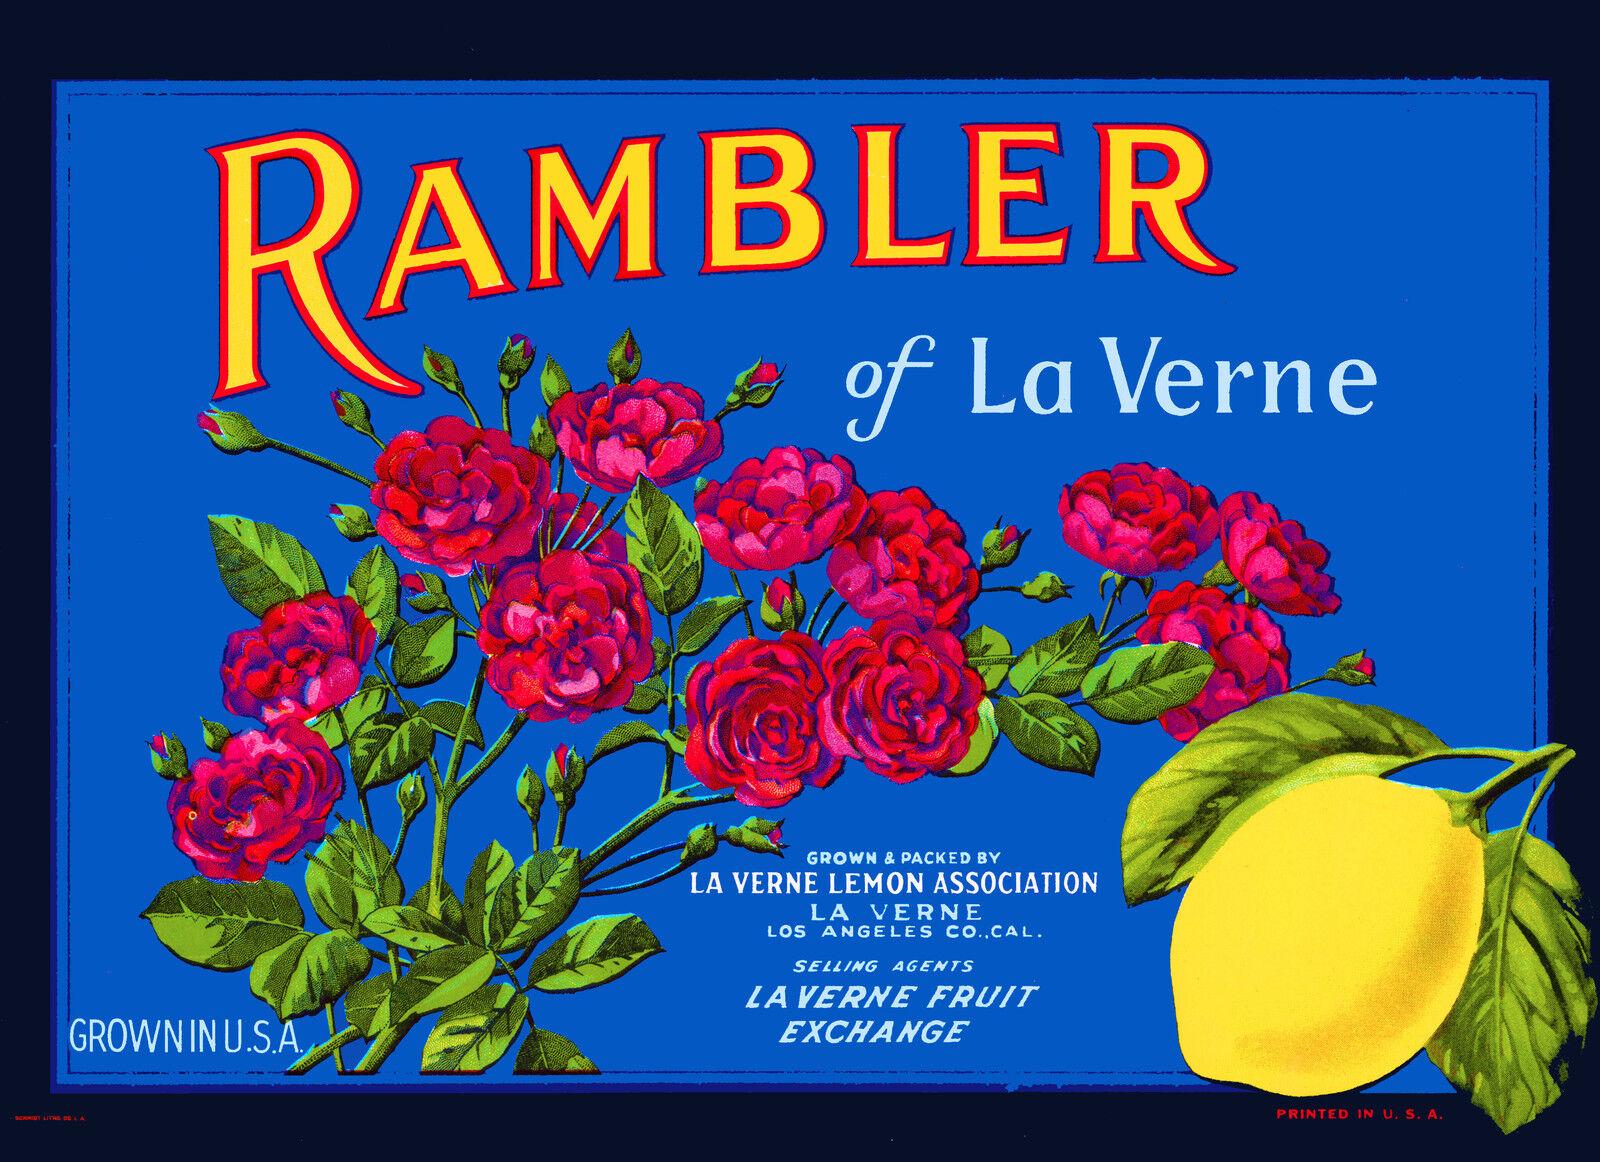 Lordsburg La Verne Heights Los Angeles Orange Citrus Fruit Crate Label Art Print